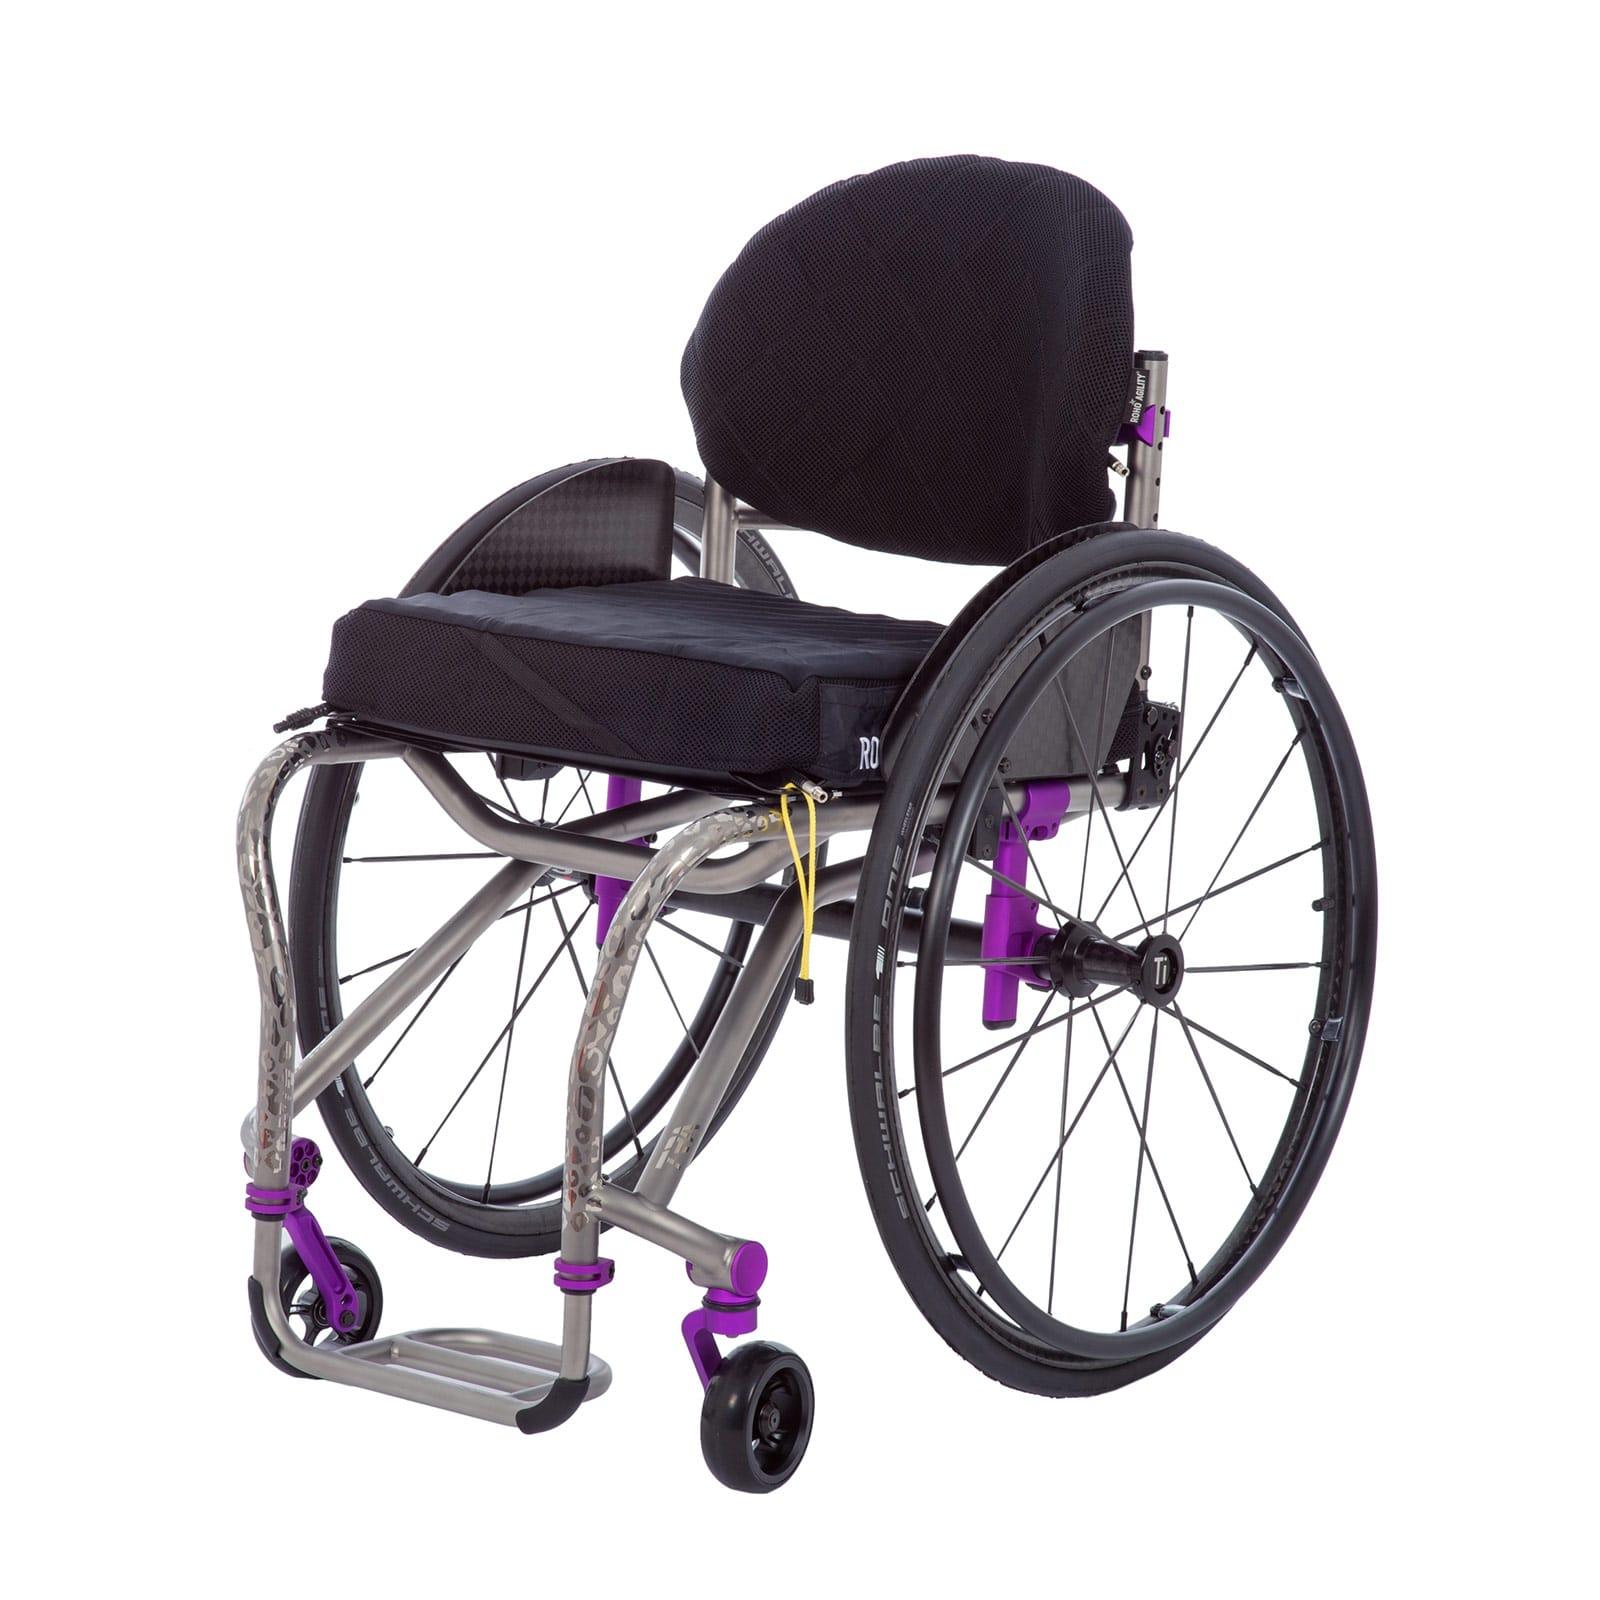 TRA Tilite rigid active wheelchair